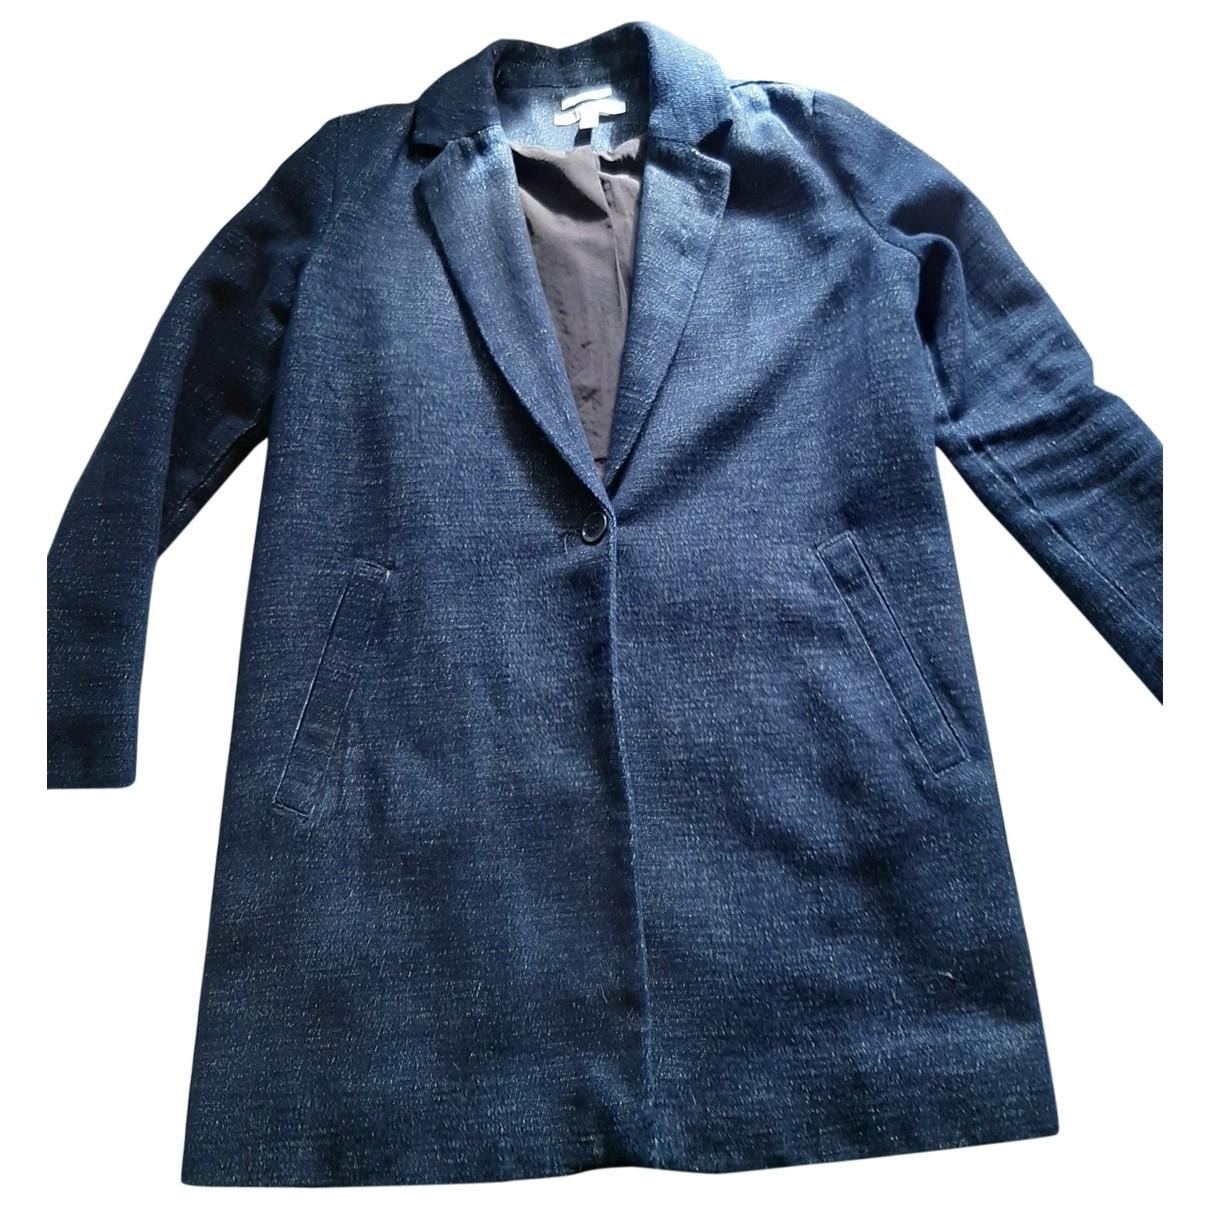 Zara \N Blue Denim - Jeans coat for Women M International